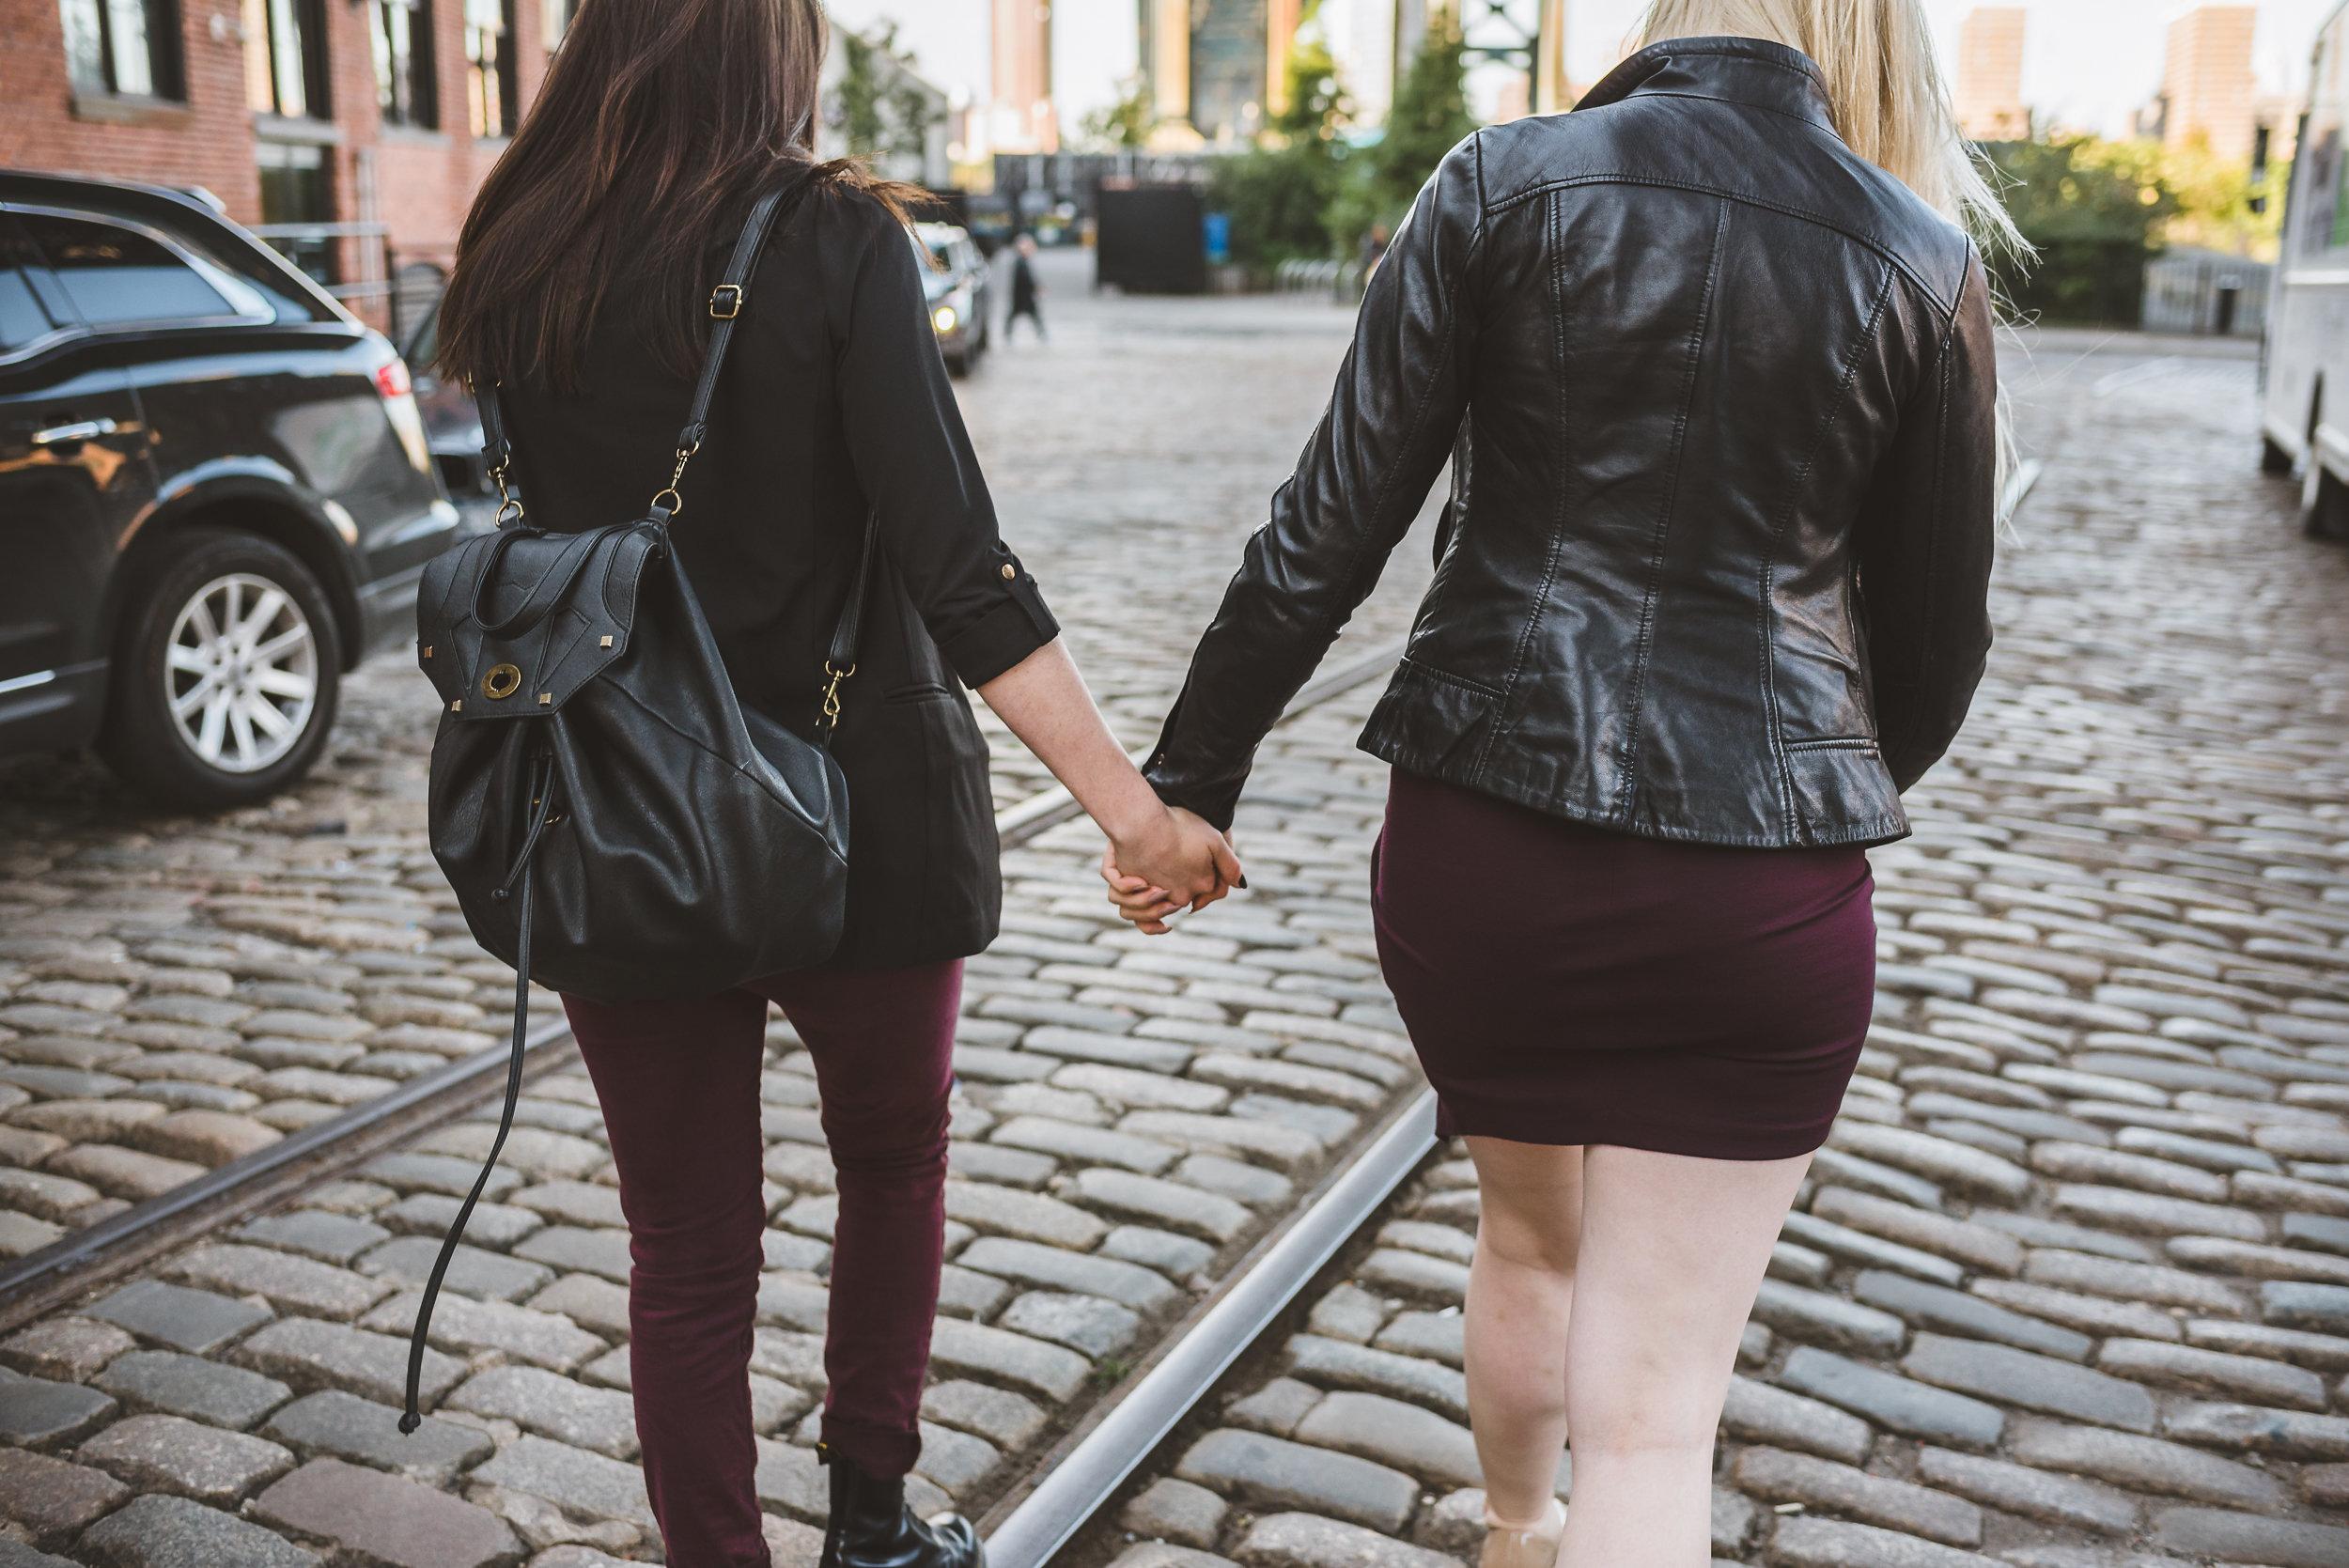 Alexa&Emily Dumbo NYC Couples Session (22).JPG